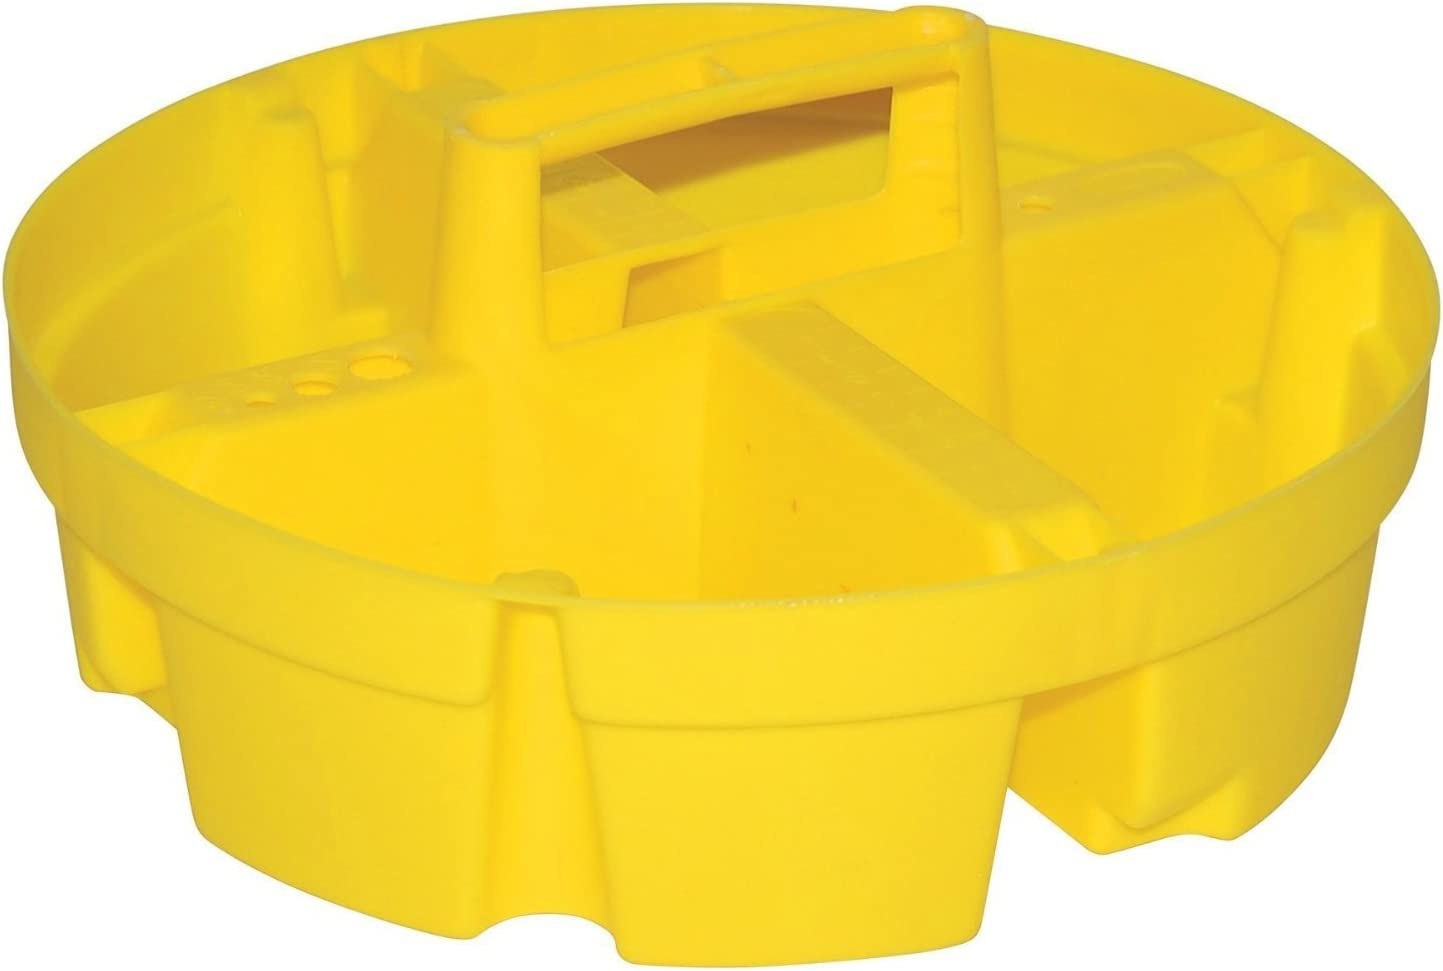 5 Gallon Bucket Stacker Parts Organizer Trays Quantity 6 Bucket Boss